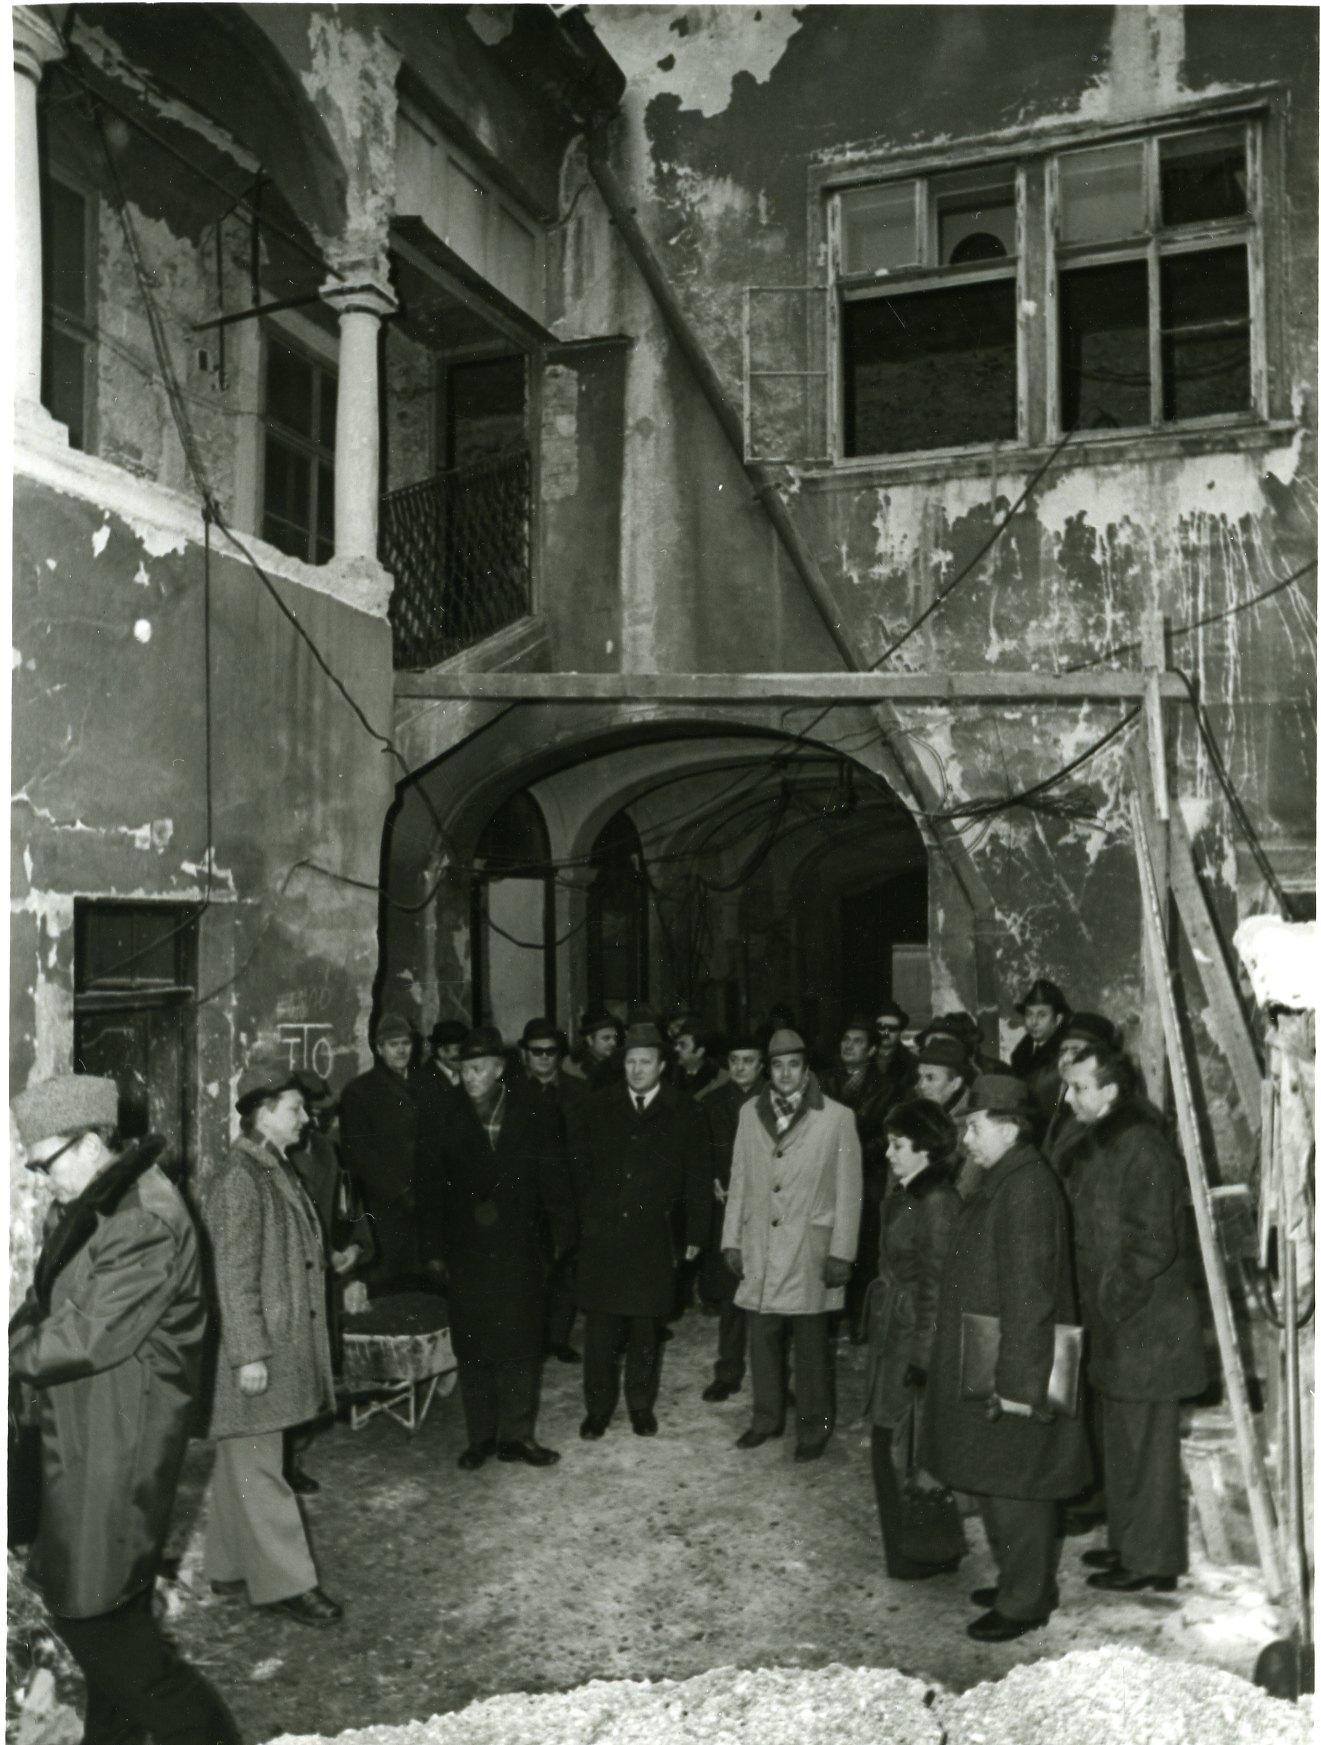 muzeumi_felujitas_1975_79_az_udvar_a_bizottsaggal_kapualj_fele611_1.jpg